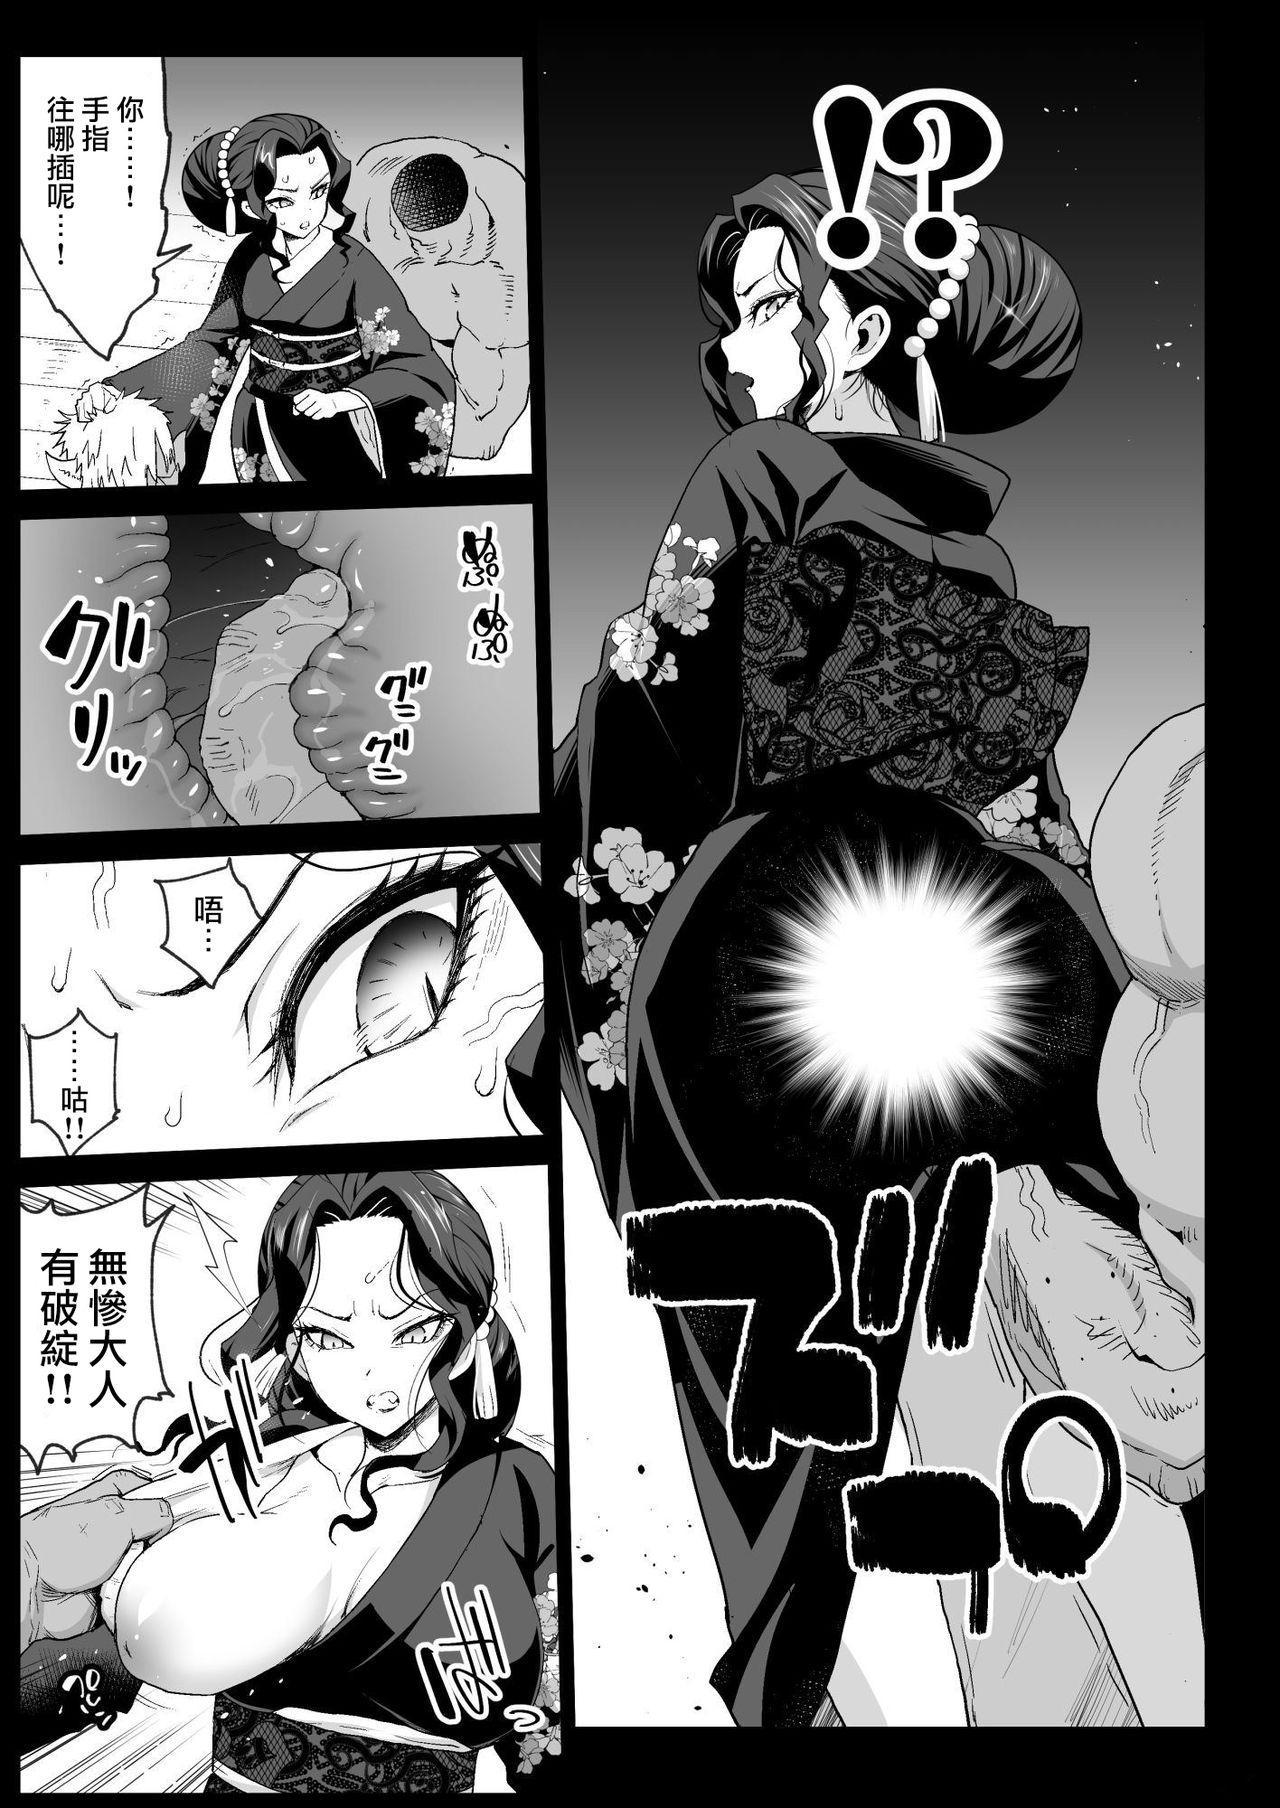 Eromazun (Ma-kurou)] Mesu Ochi Jou Muzan-sama - RAPE OF DEMON SLAYER 4 (Kimetsu no Yaiba) [Chinese] [瑞树汉化组&BW重嵌] [Decensored] [Digital] 9